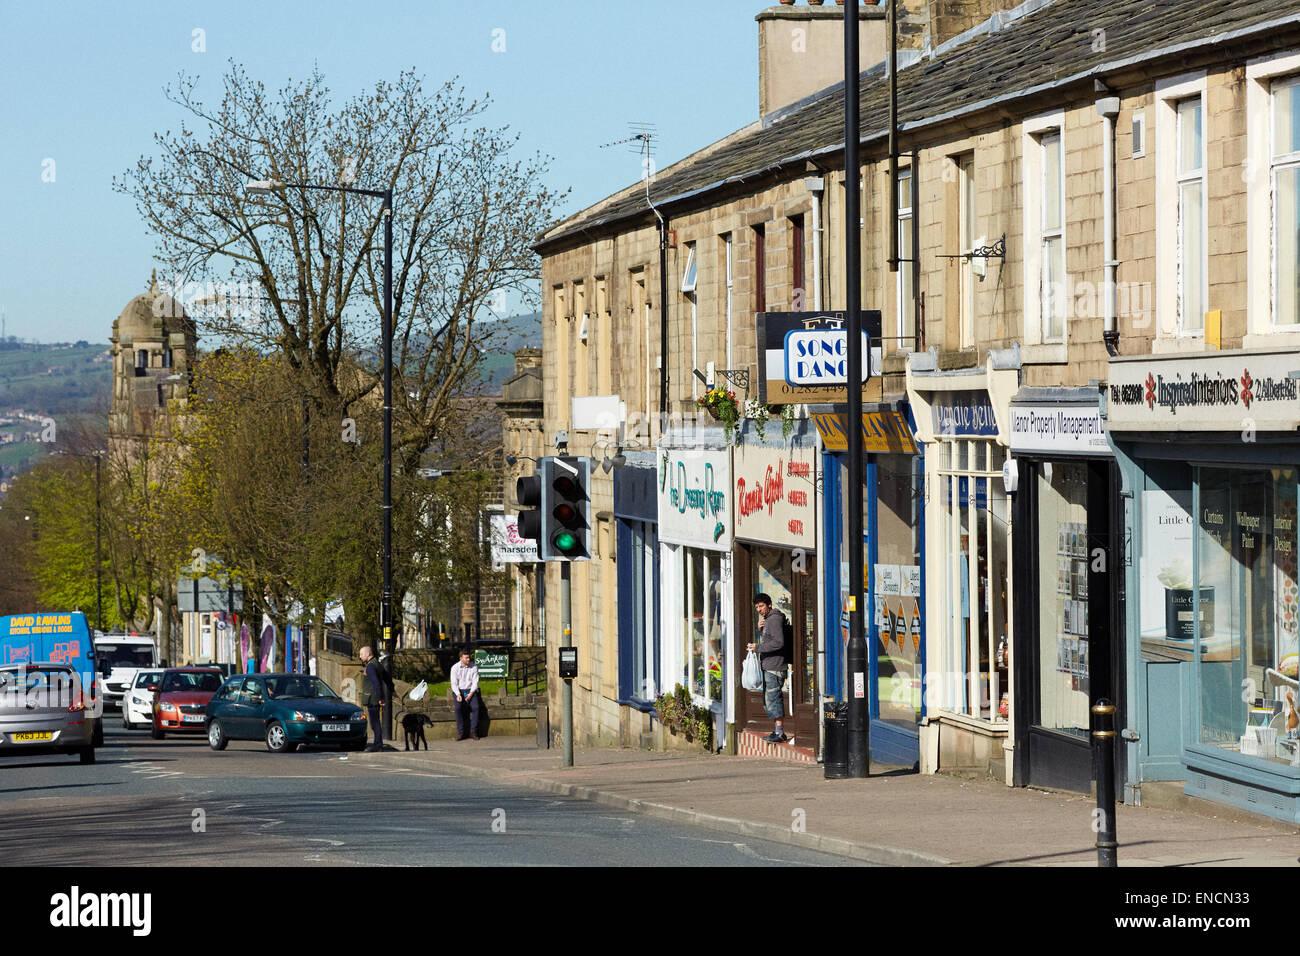 Albert road Colne lancashire - Stock Image